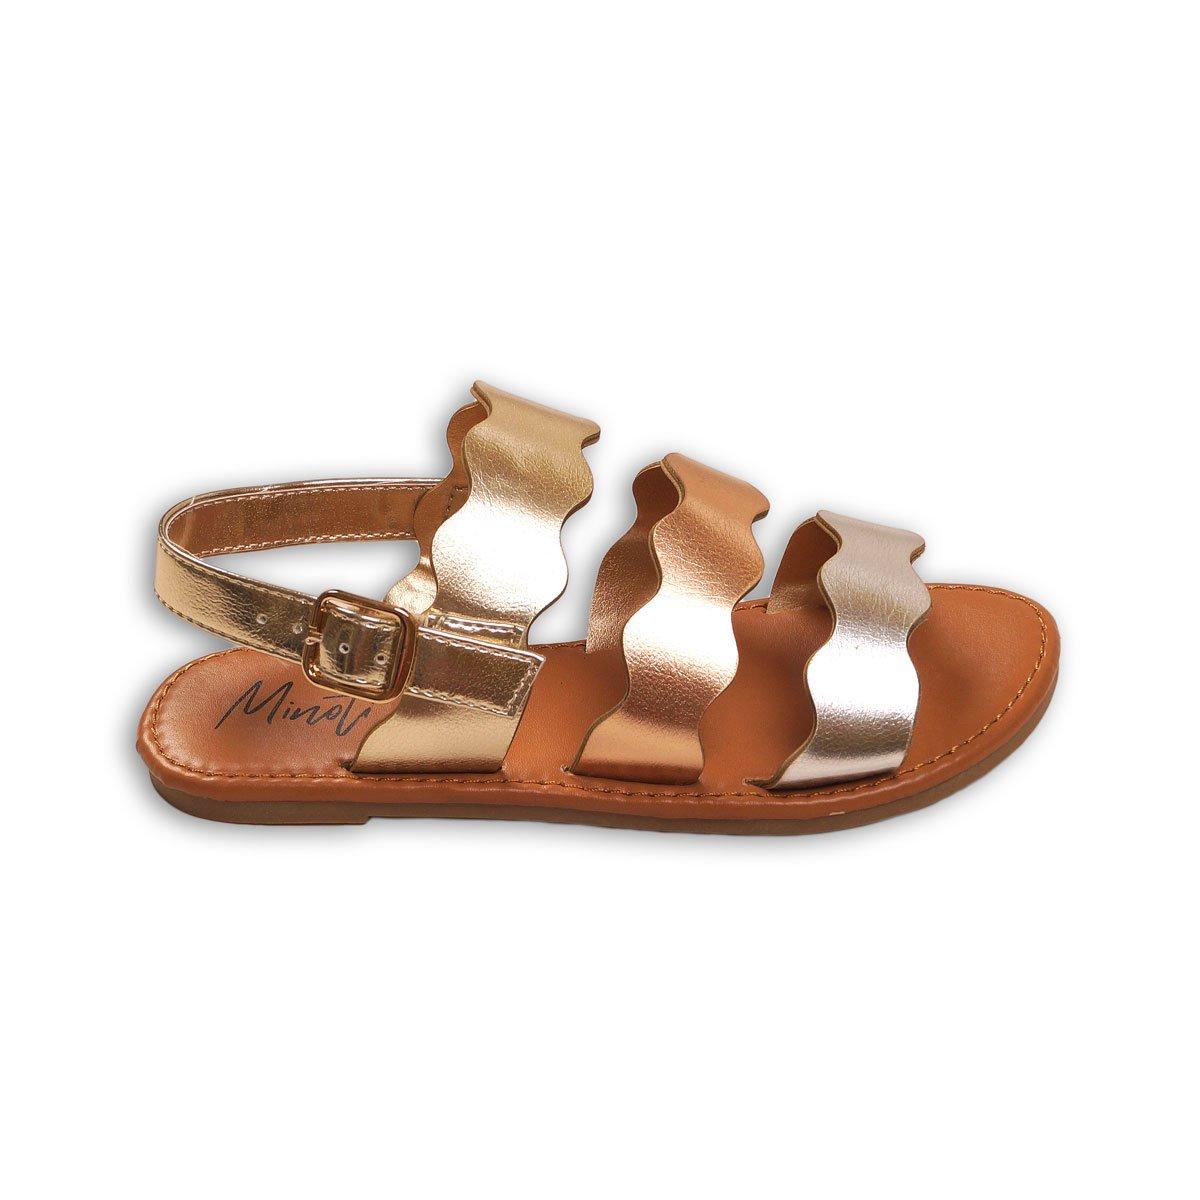 Sandale in curele crestate, Minoti Shoe